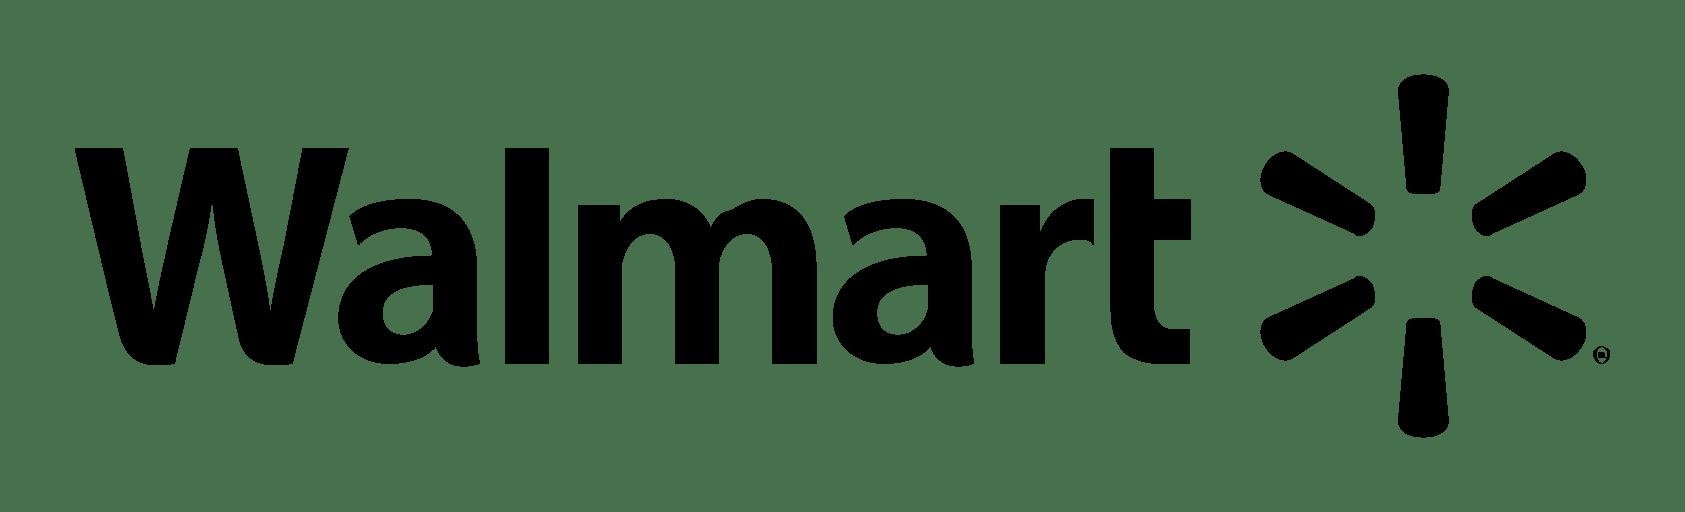 Walmart Logo Text transparent PNG.